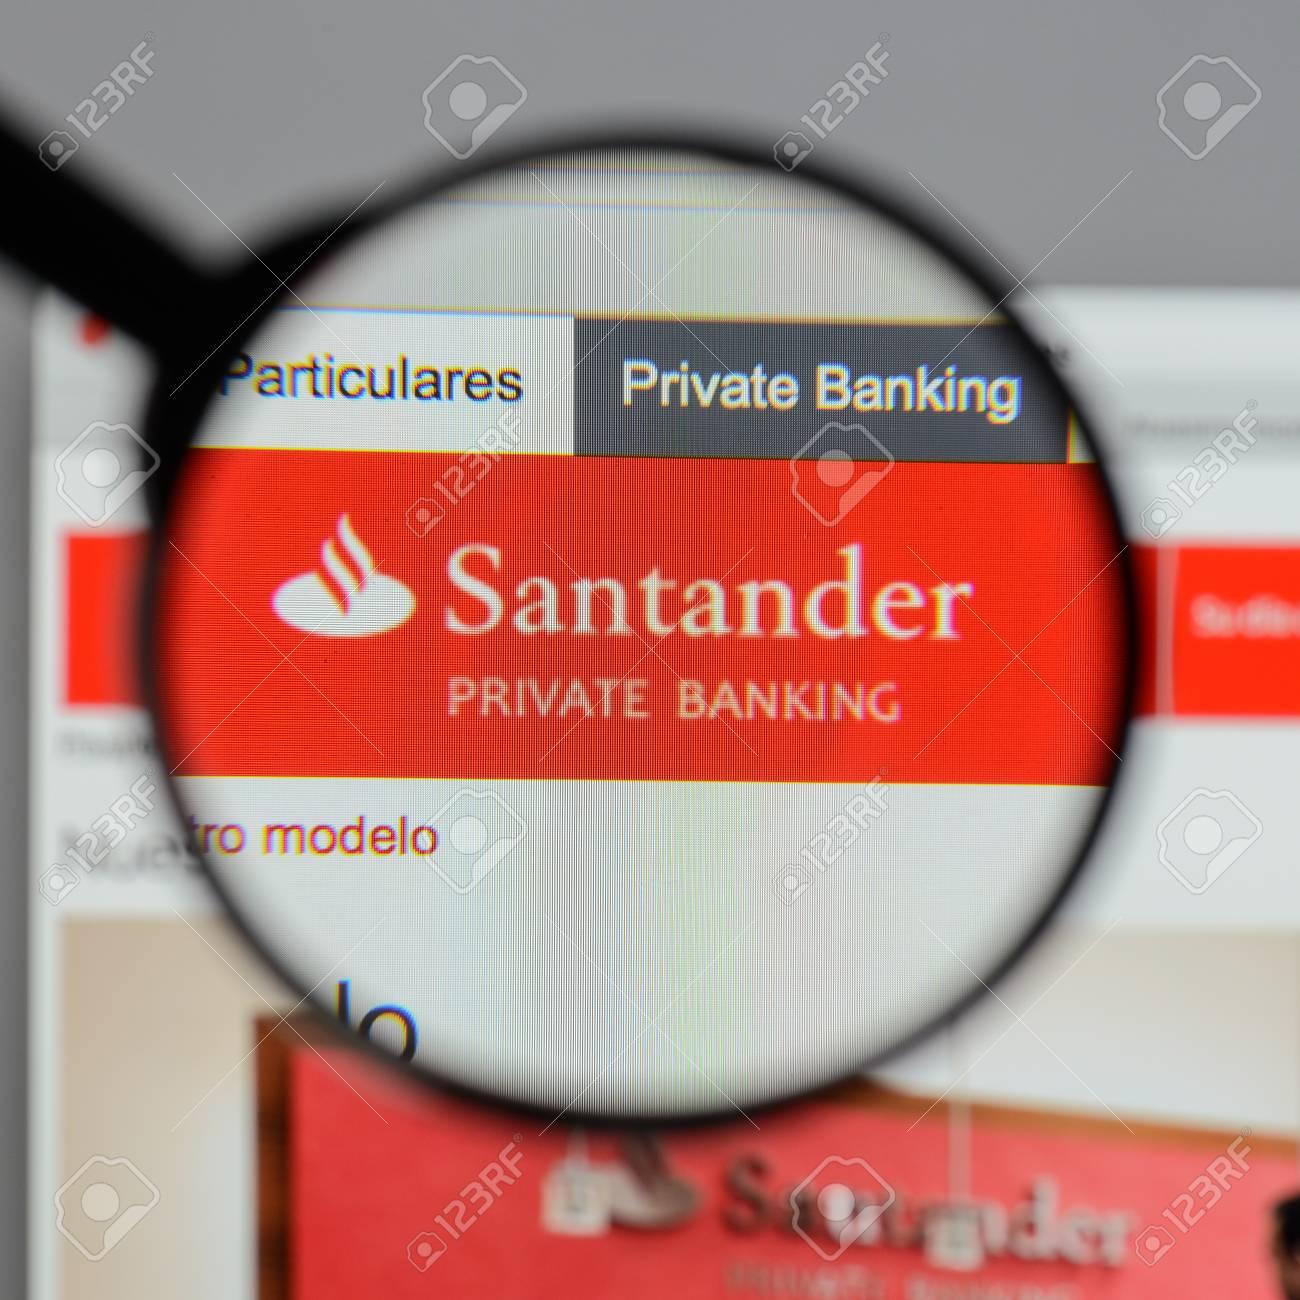 Milan, Italy - August 10, 2017: Banco Santander logo on the website